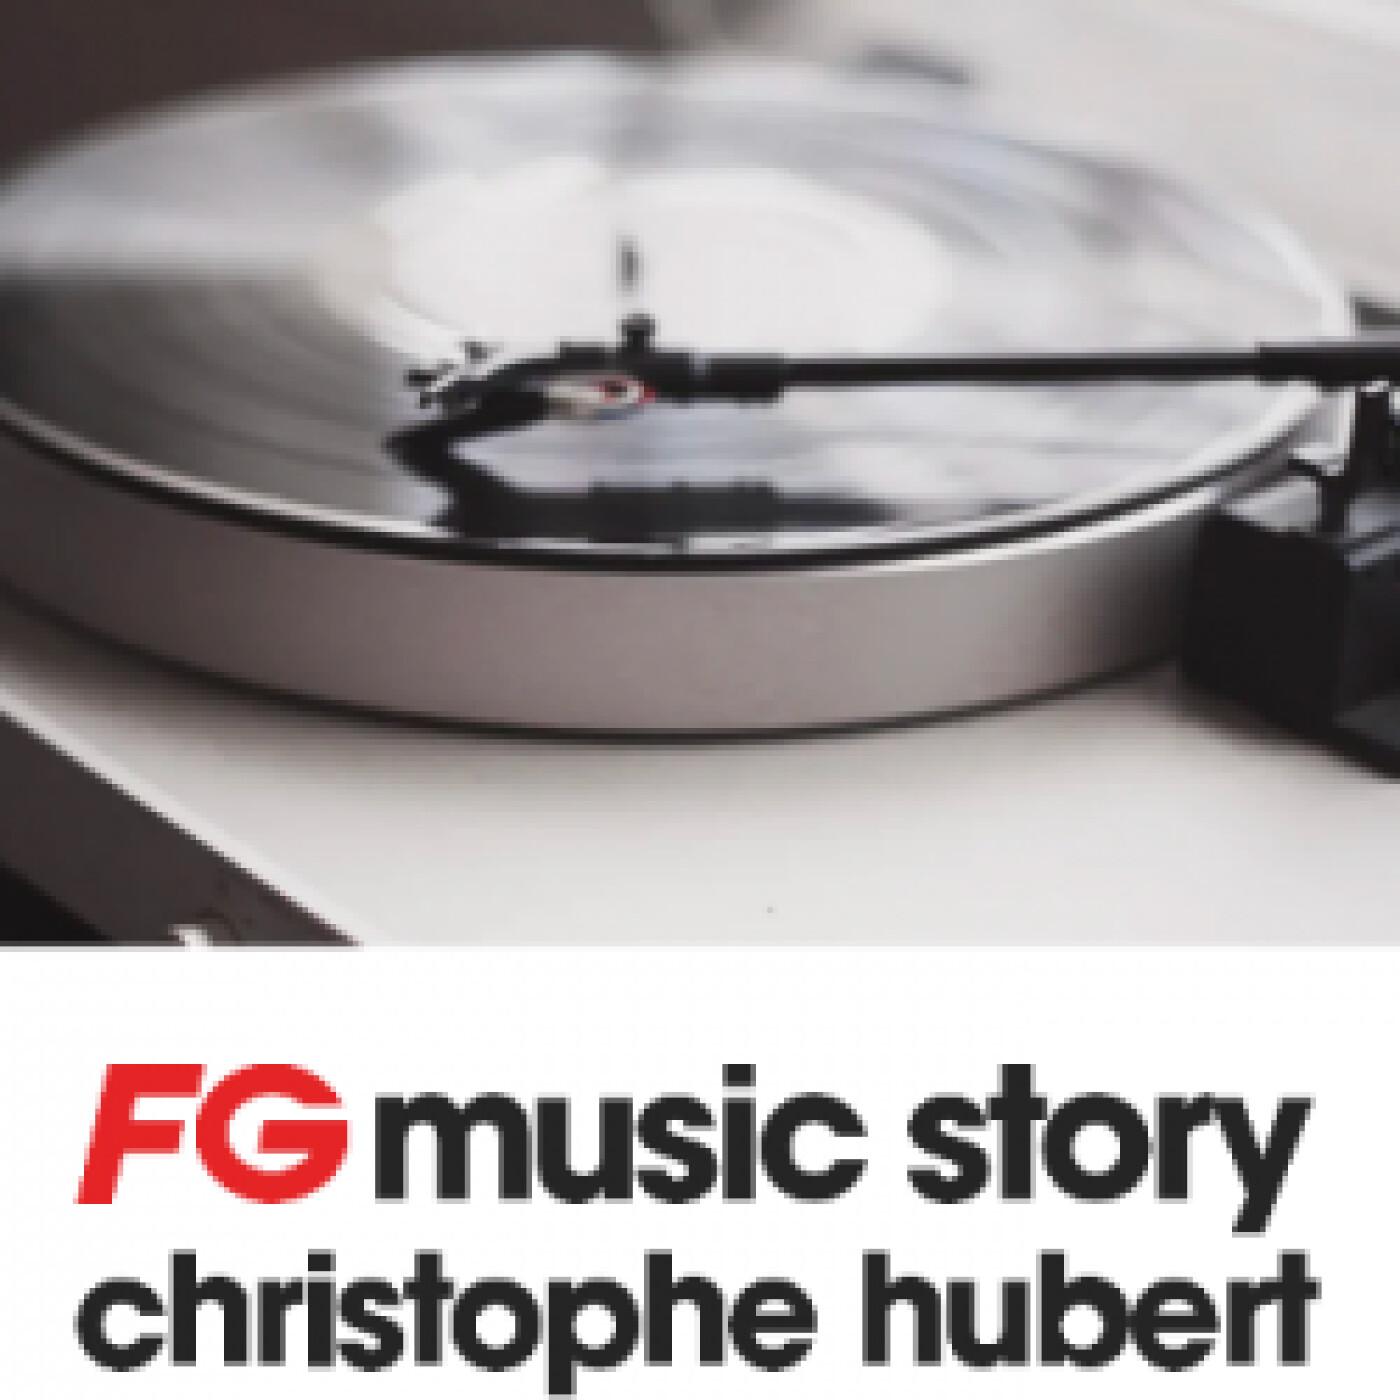 FG MUSIC STORY : LONDON GRAMMAR